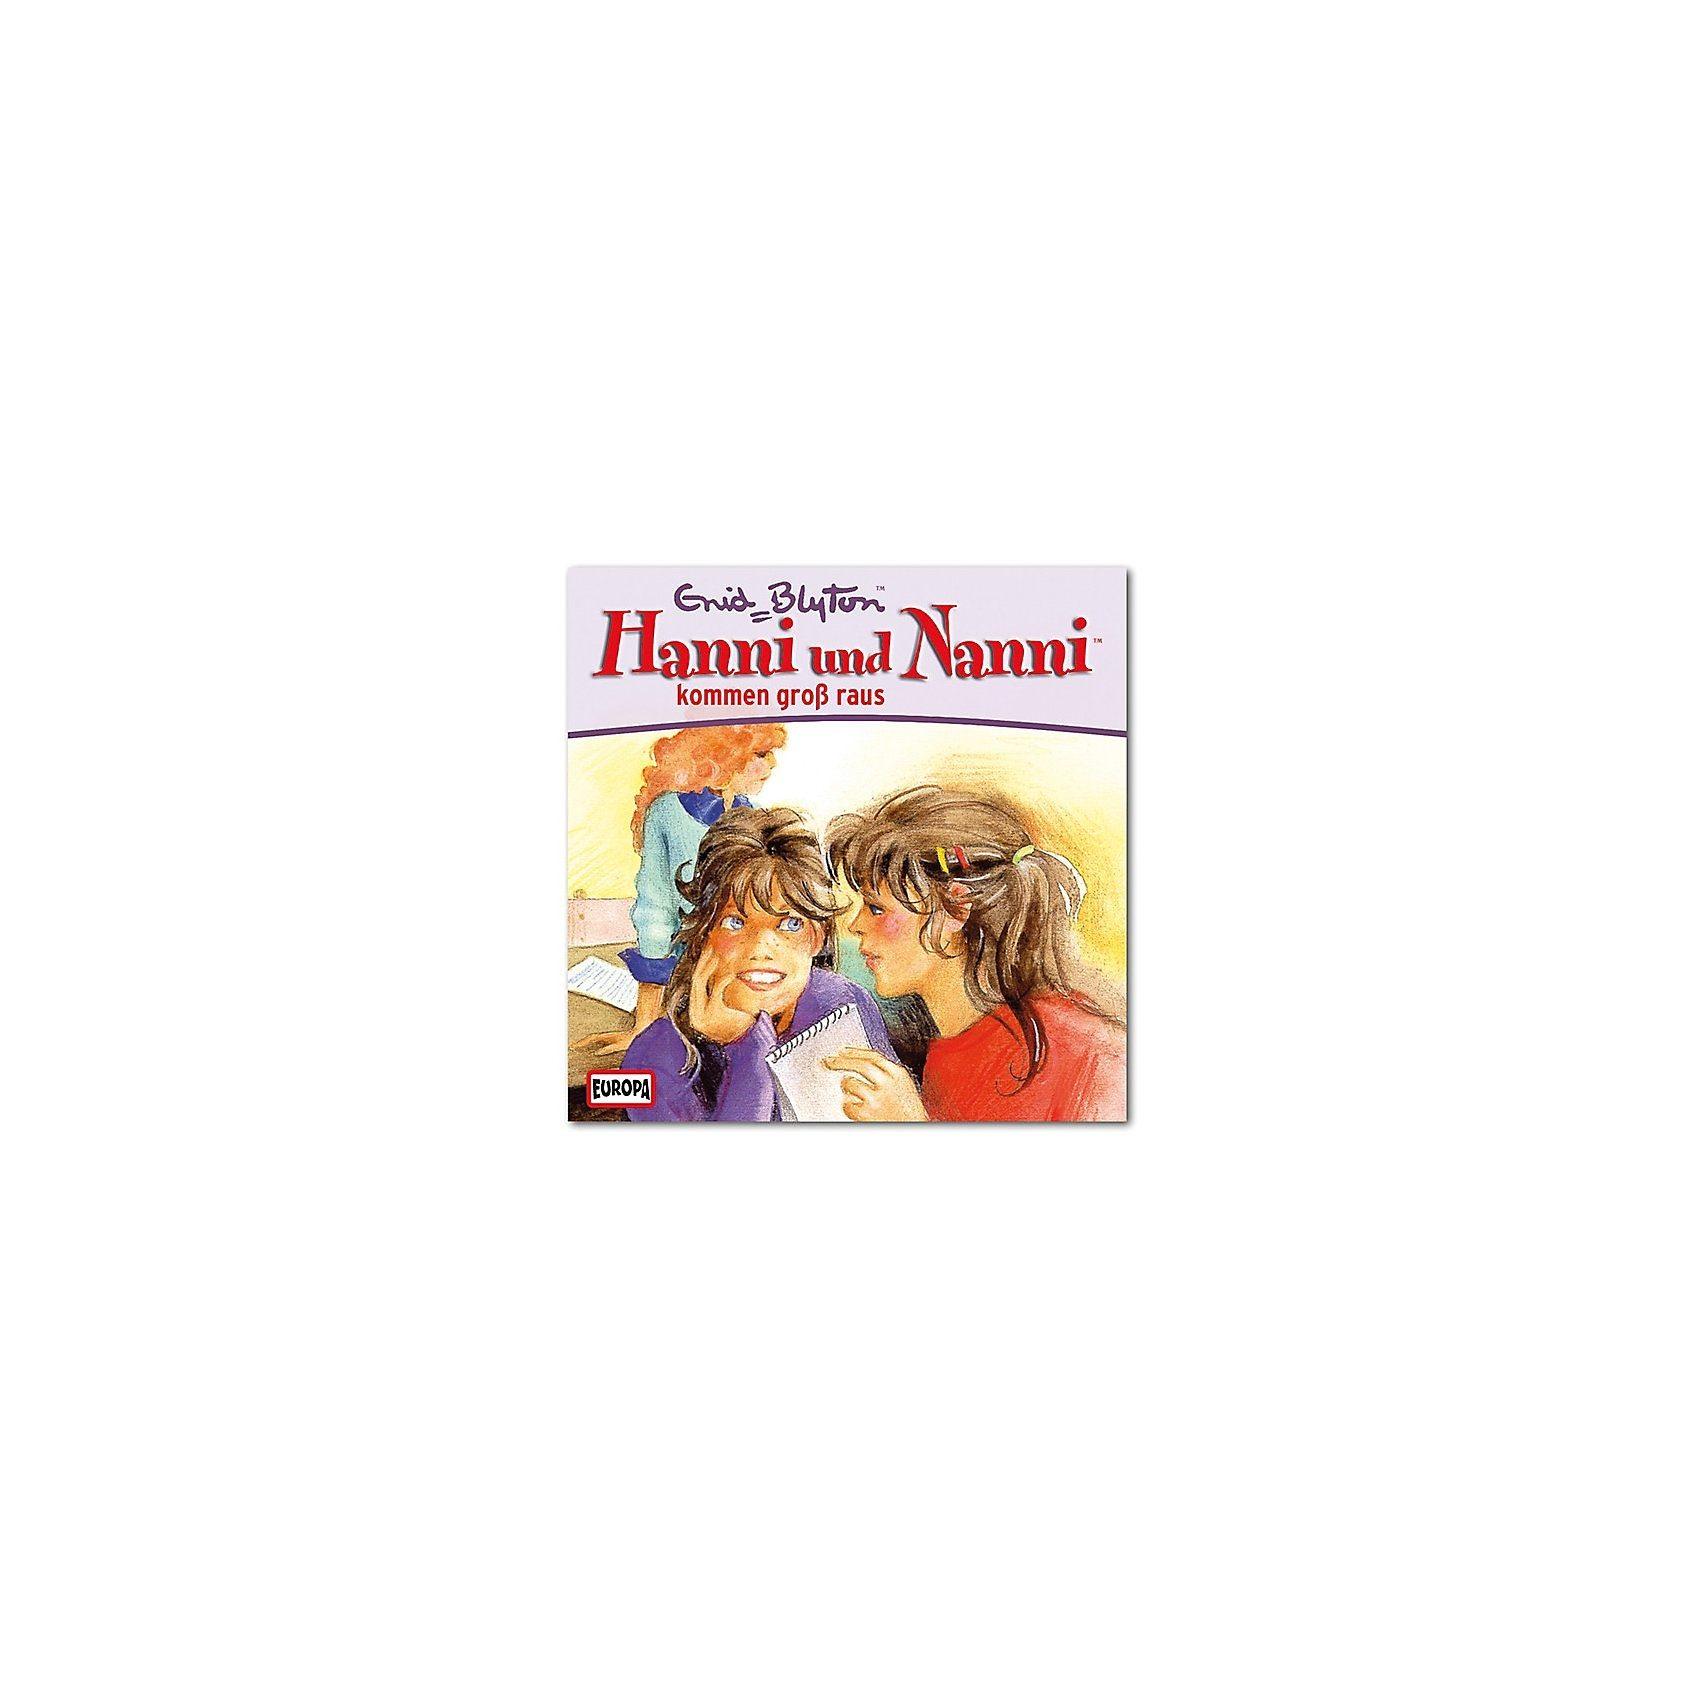 Sony CD Hanni & Nanni 16 - kommen groß raus